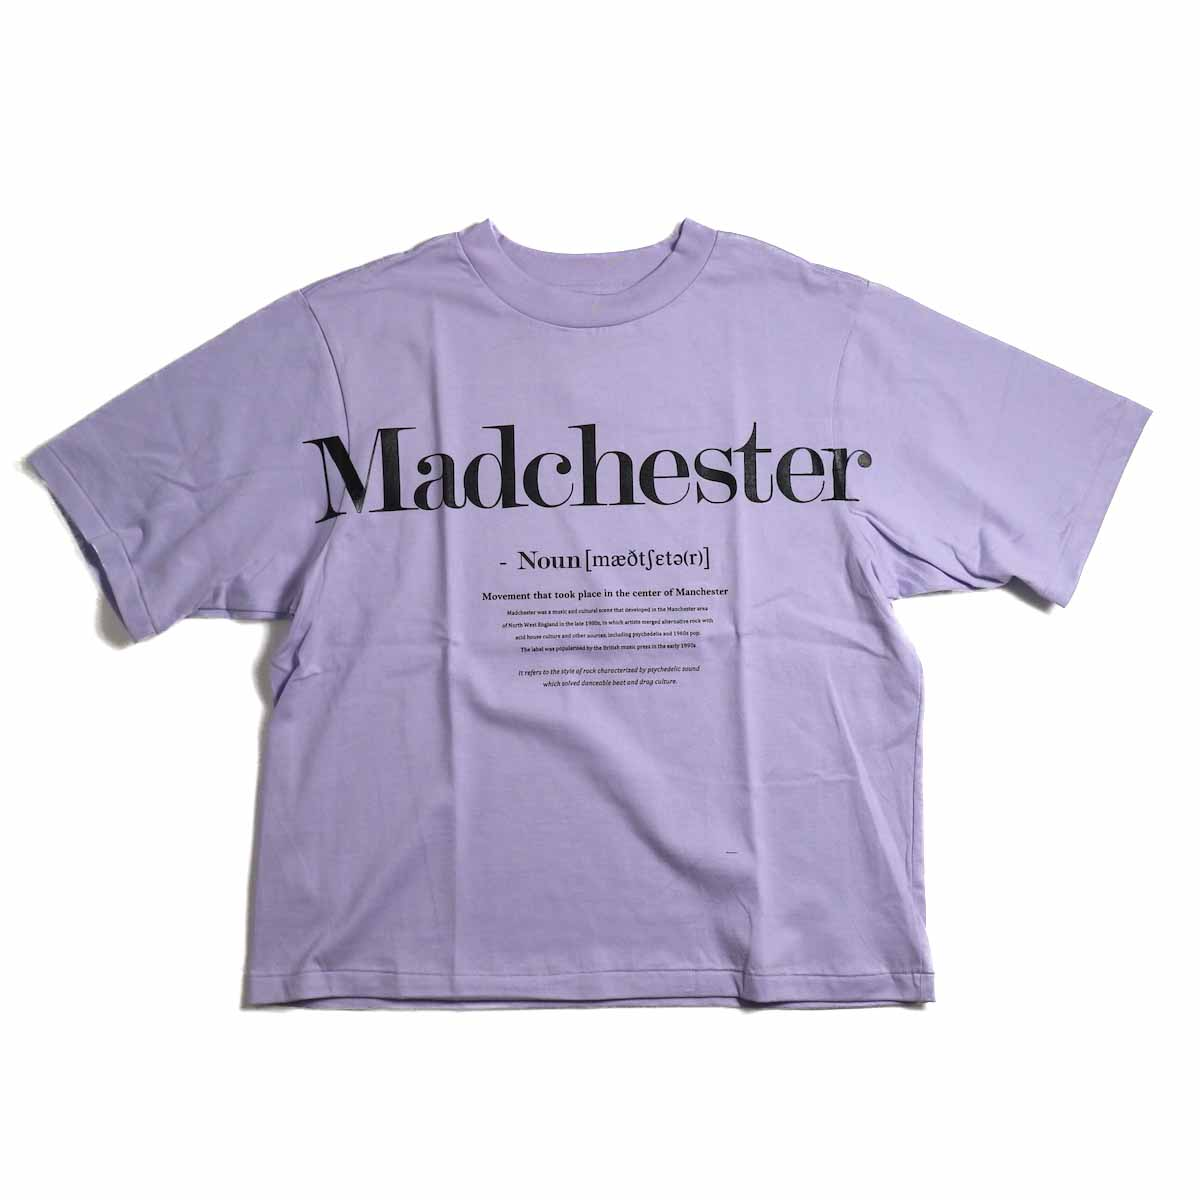 JANE SMITH / Madchester Short Sleeve T-Shirt -Purple